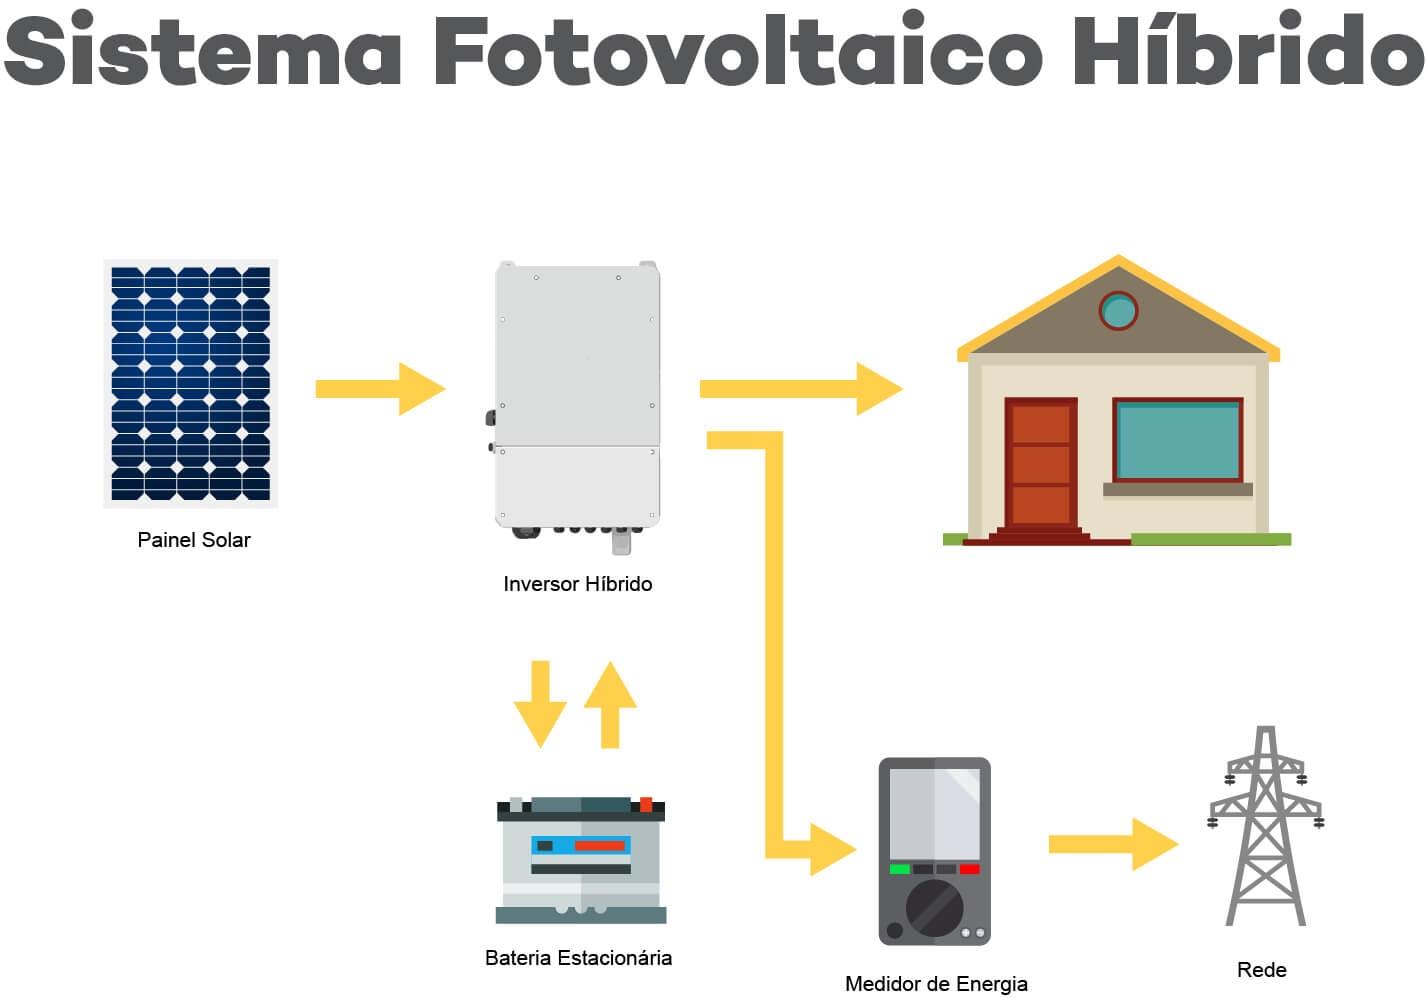 Energia Solar Fotovoltaica Sistema Híbrido